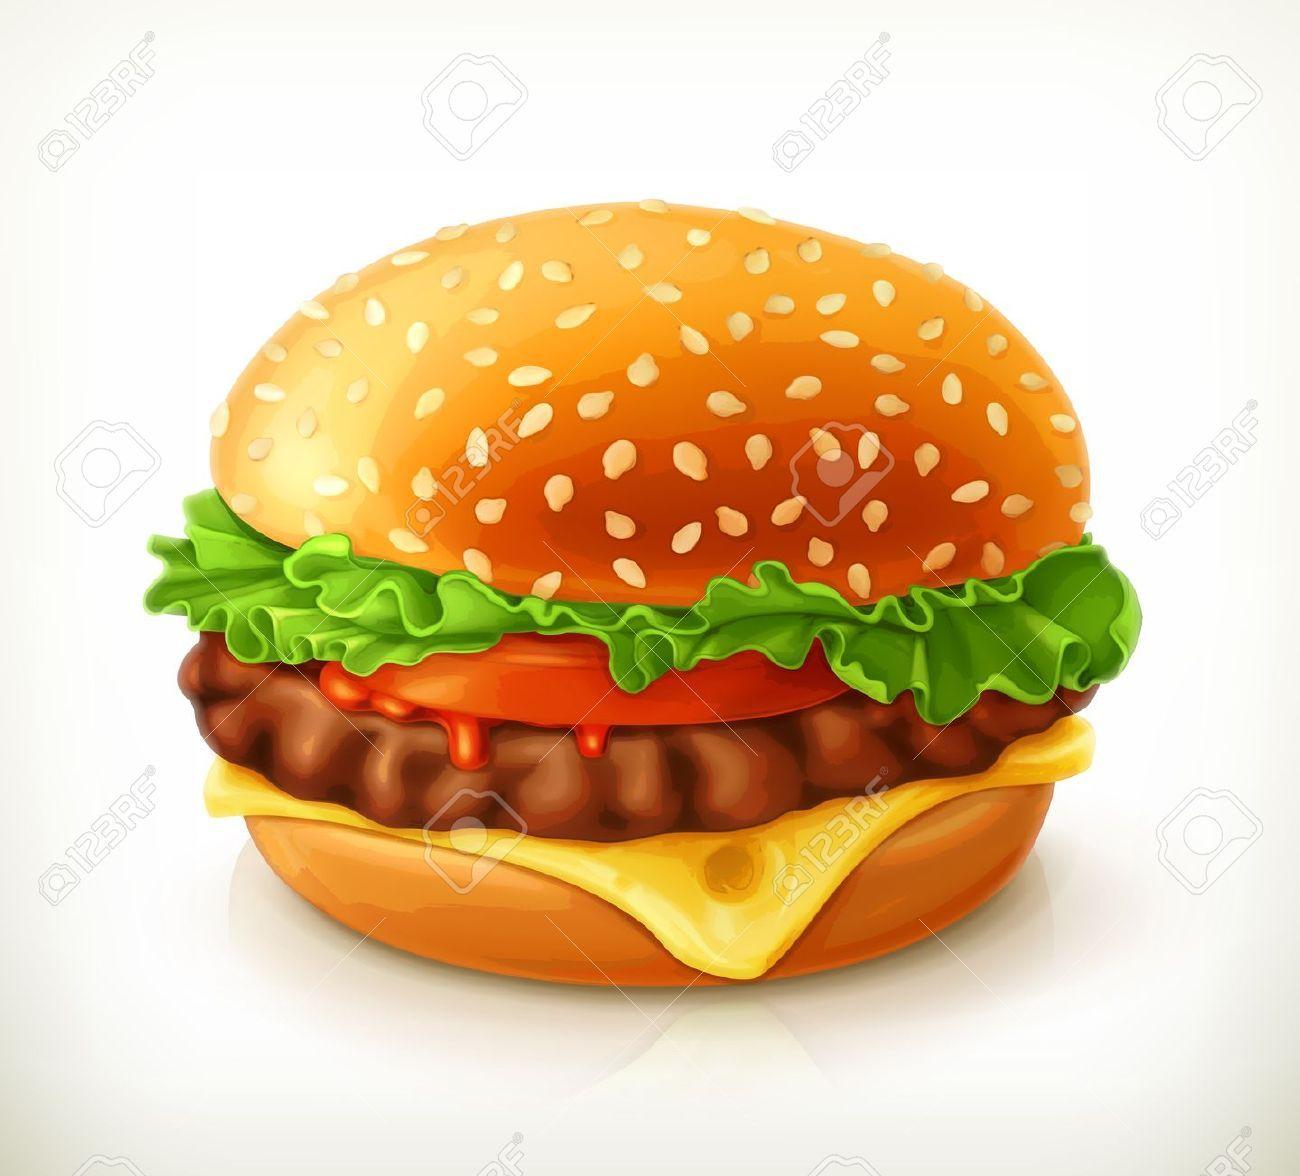 Cheeseburger simple burger